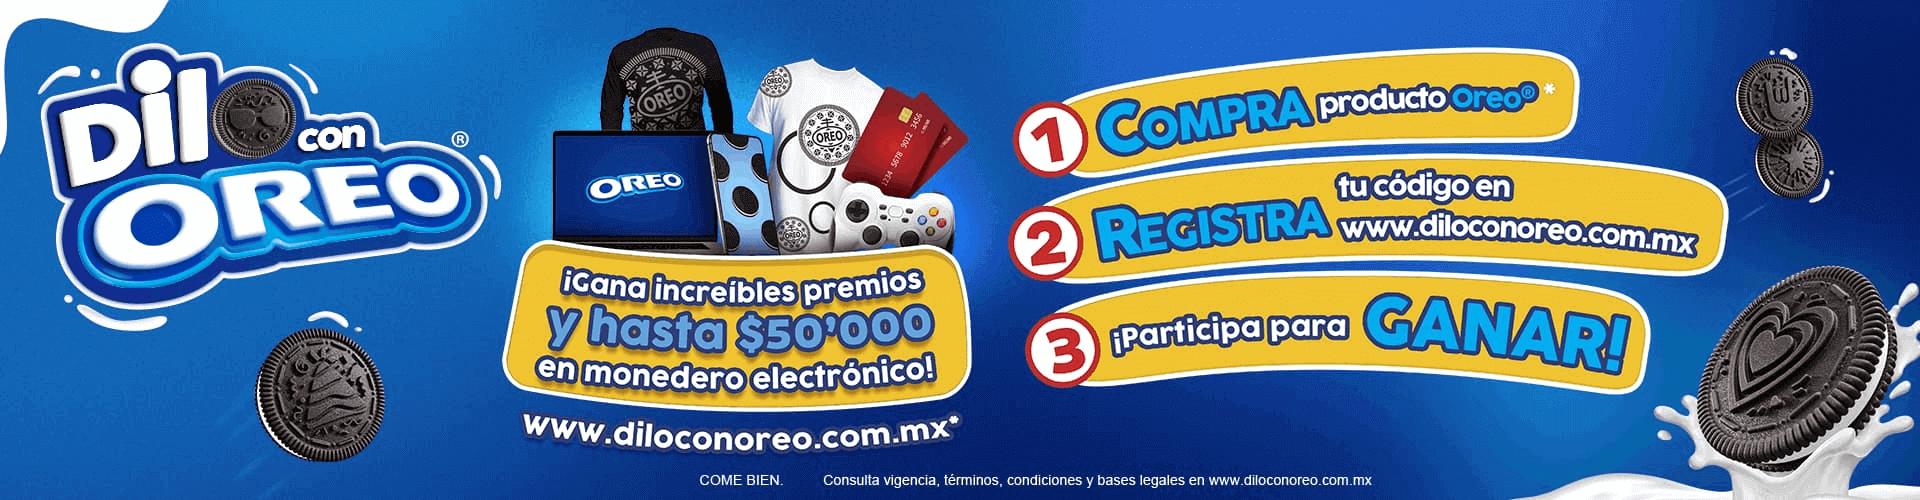 OXXO Promociones Oreo P11 2021